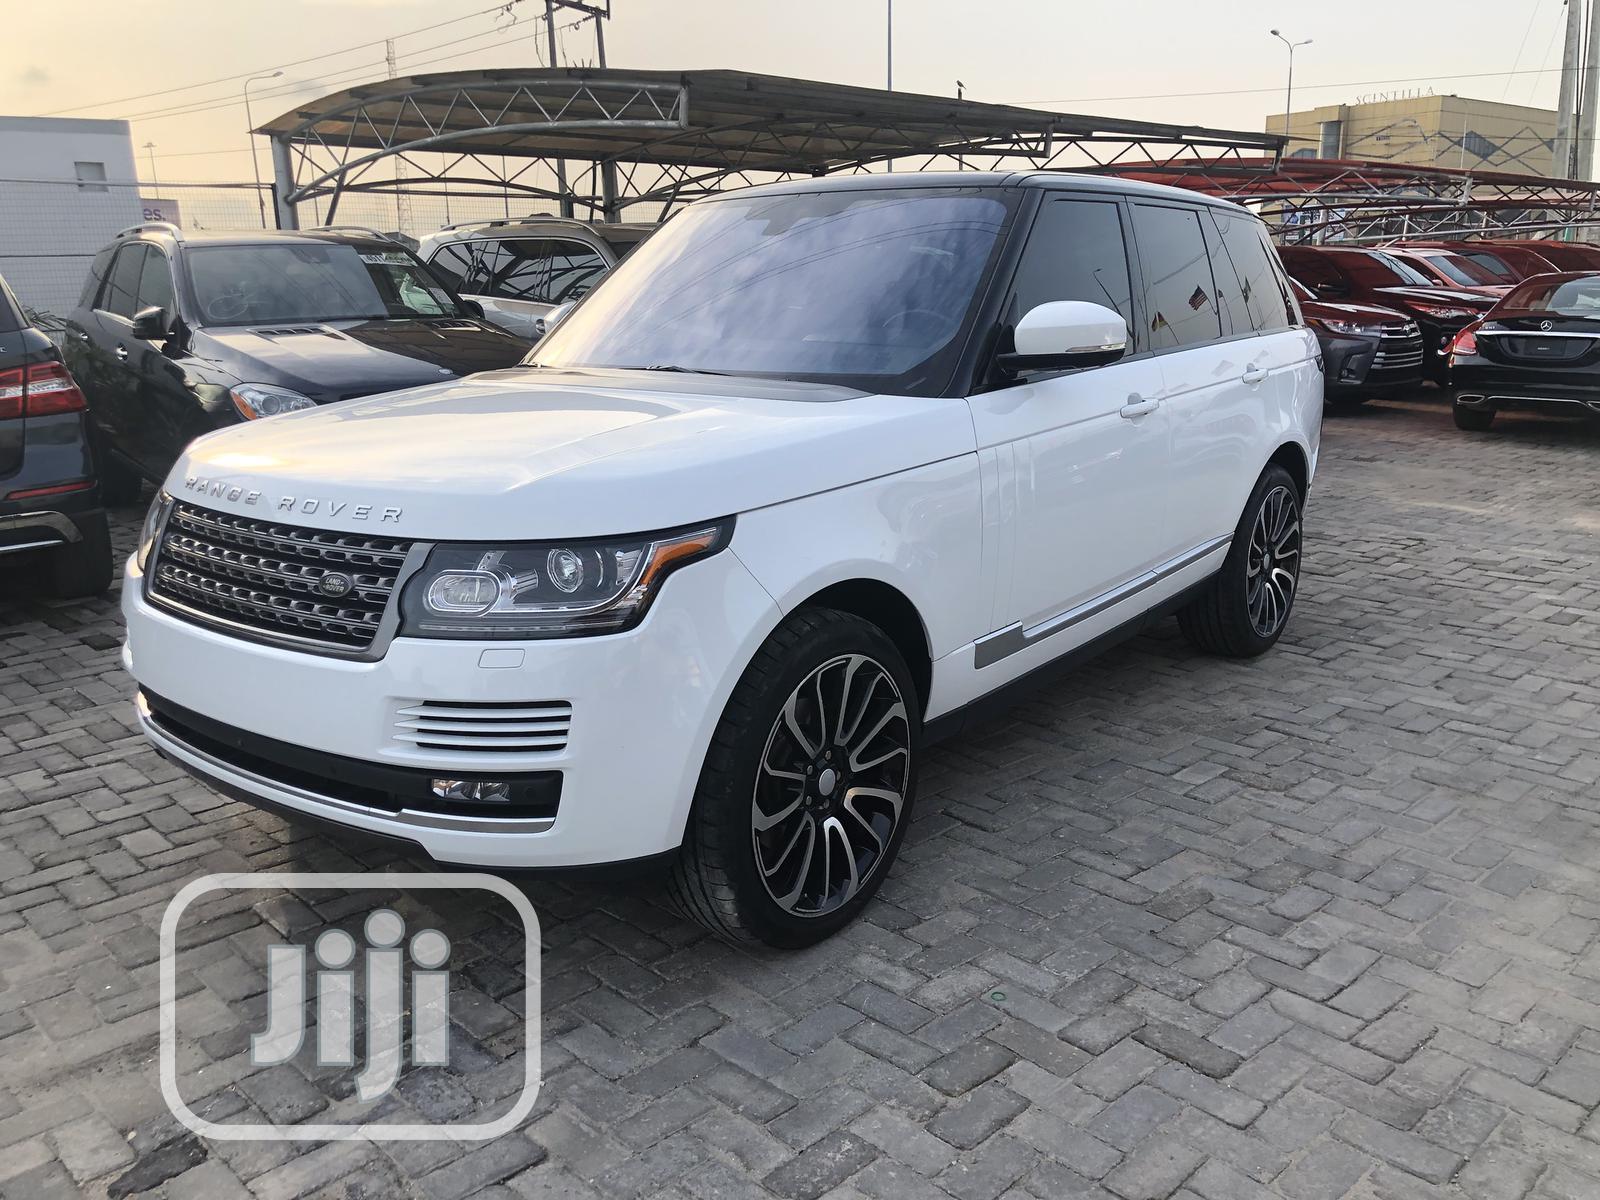 Land Rover Range Rover Vogue 2017 White   Cars for sale in Lekki, Lagos State, Nigeria